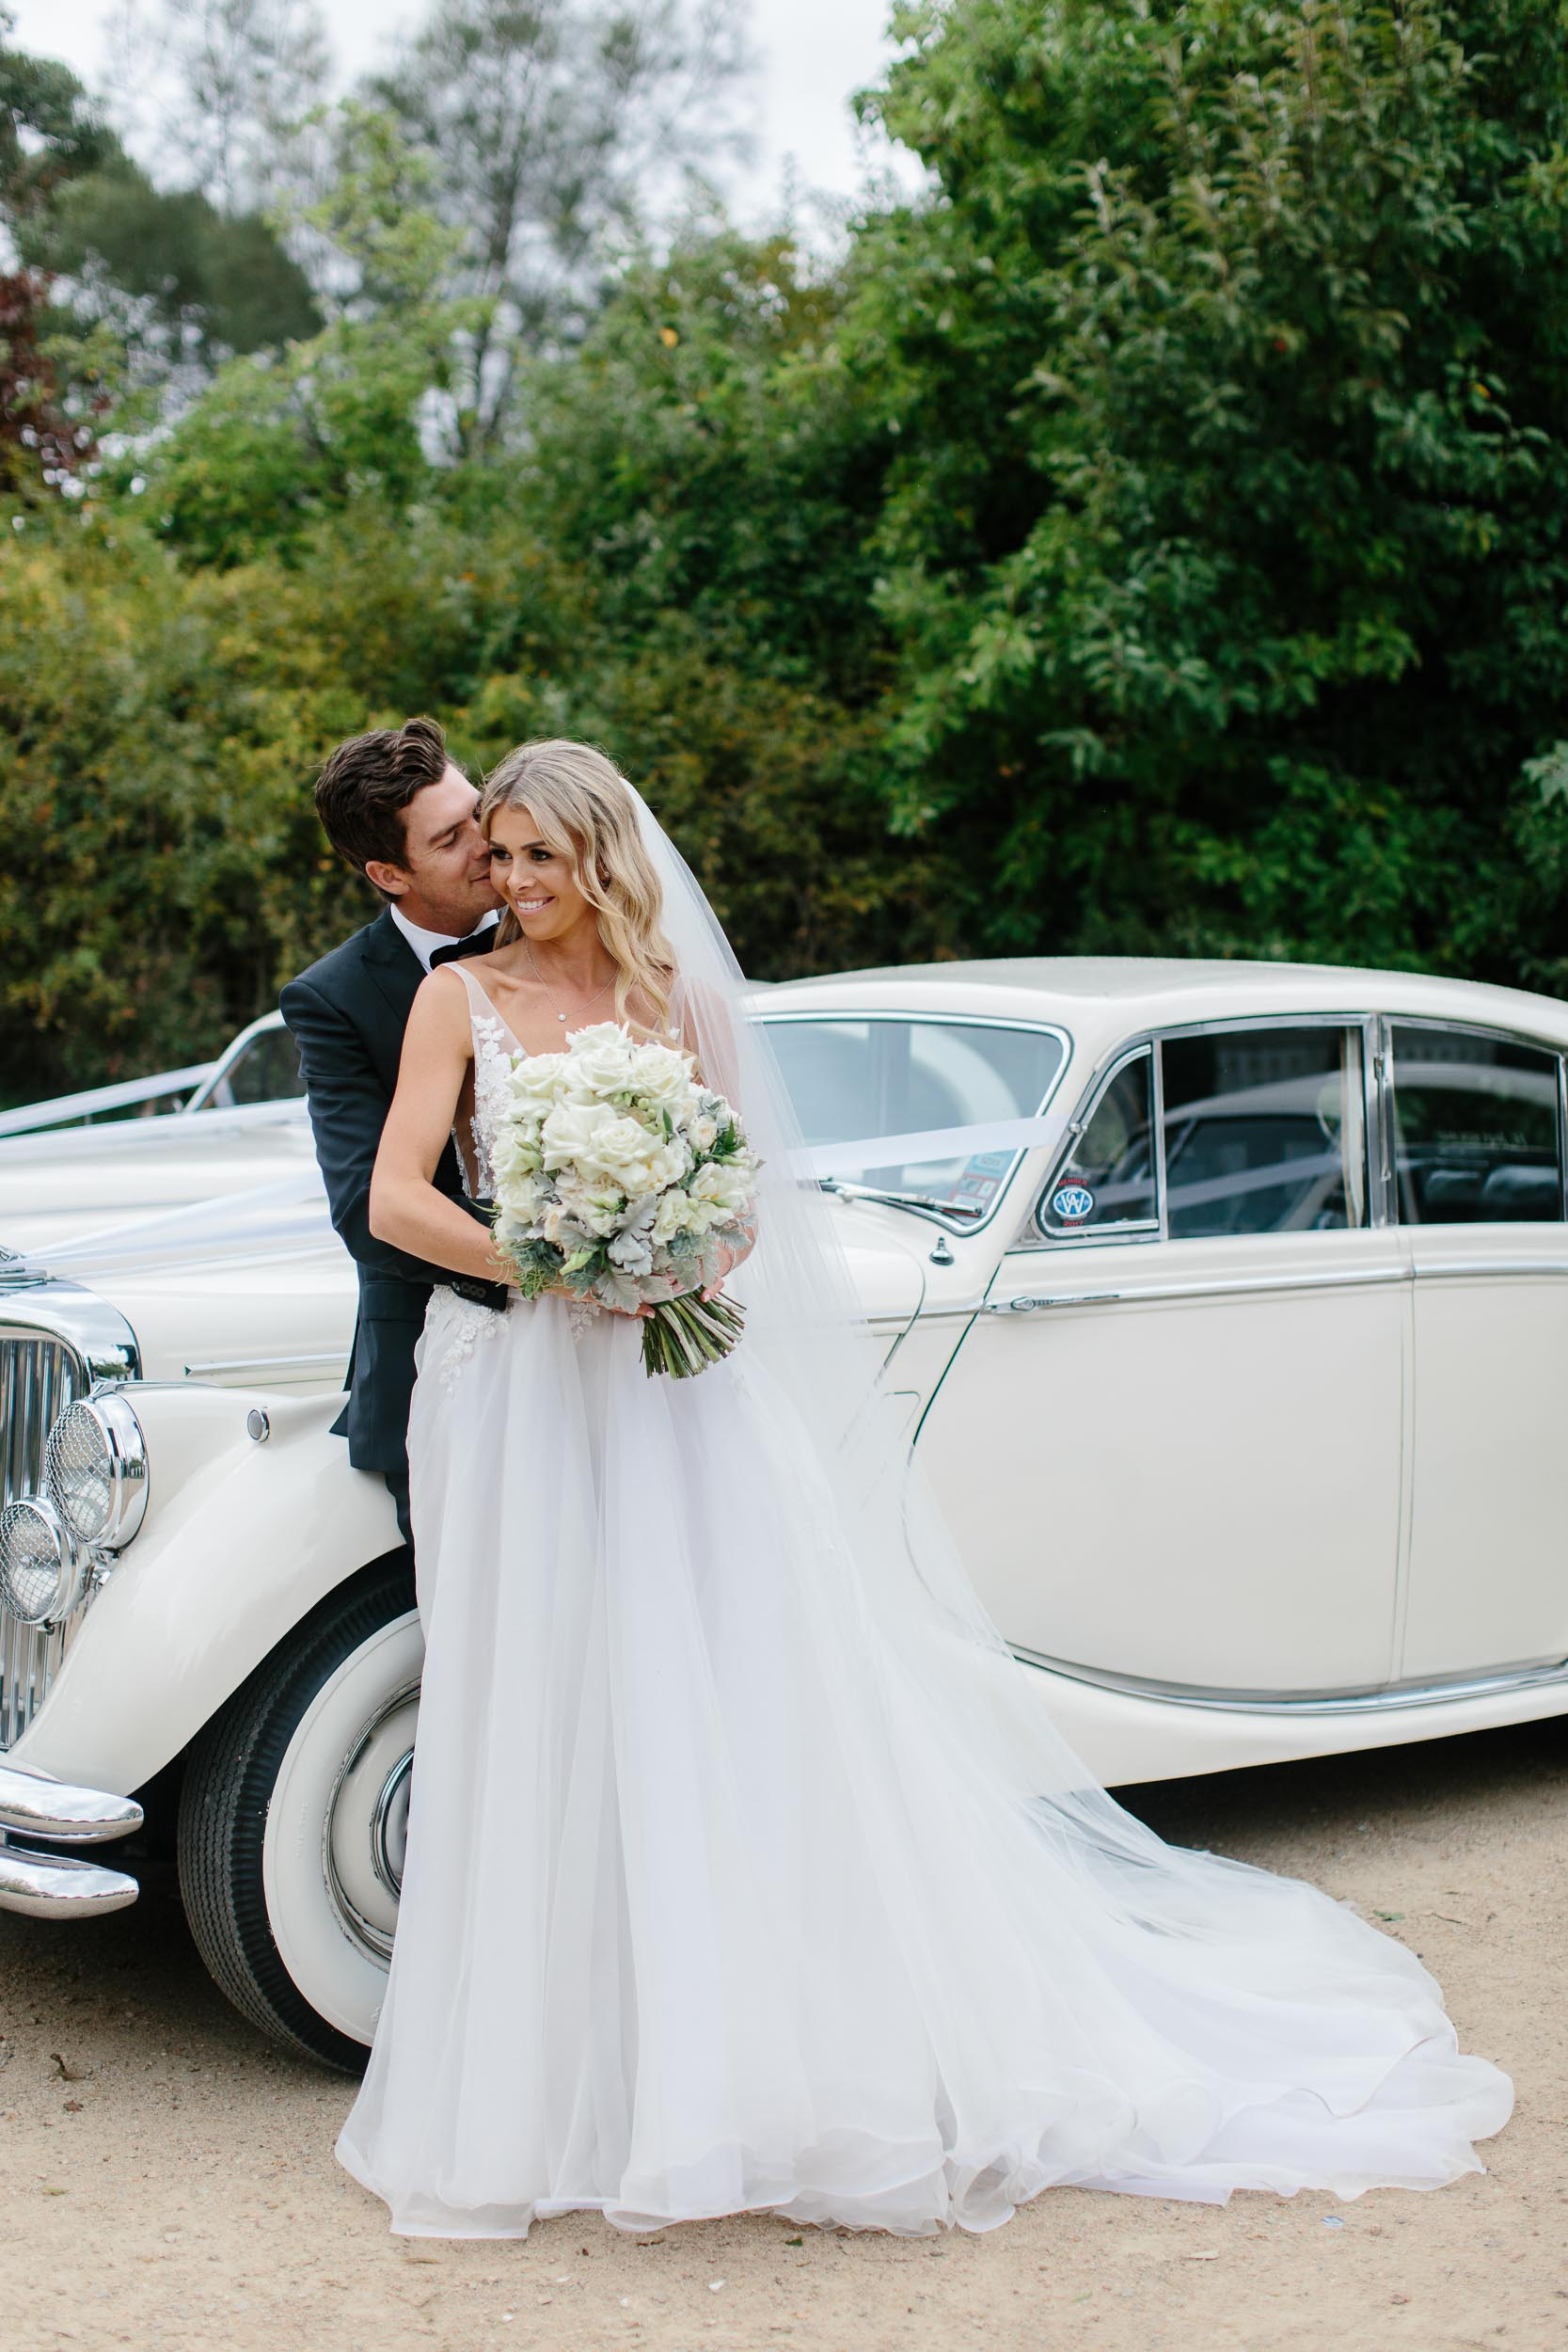 Kas-Richards-Mornington-Peninsula-Private-Property-Wedding-Marianna-Hardwick-Gown-458.jpg